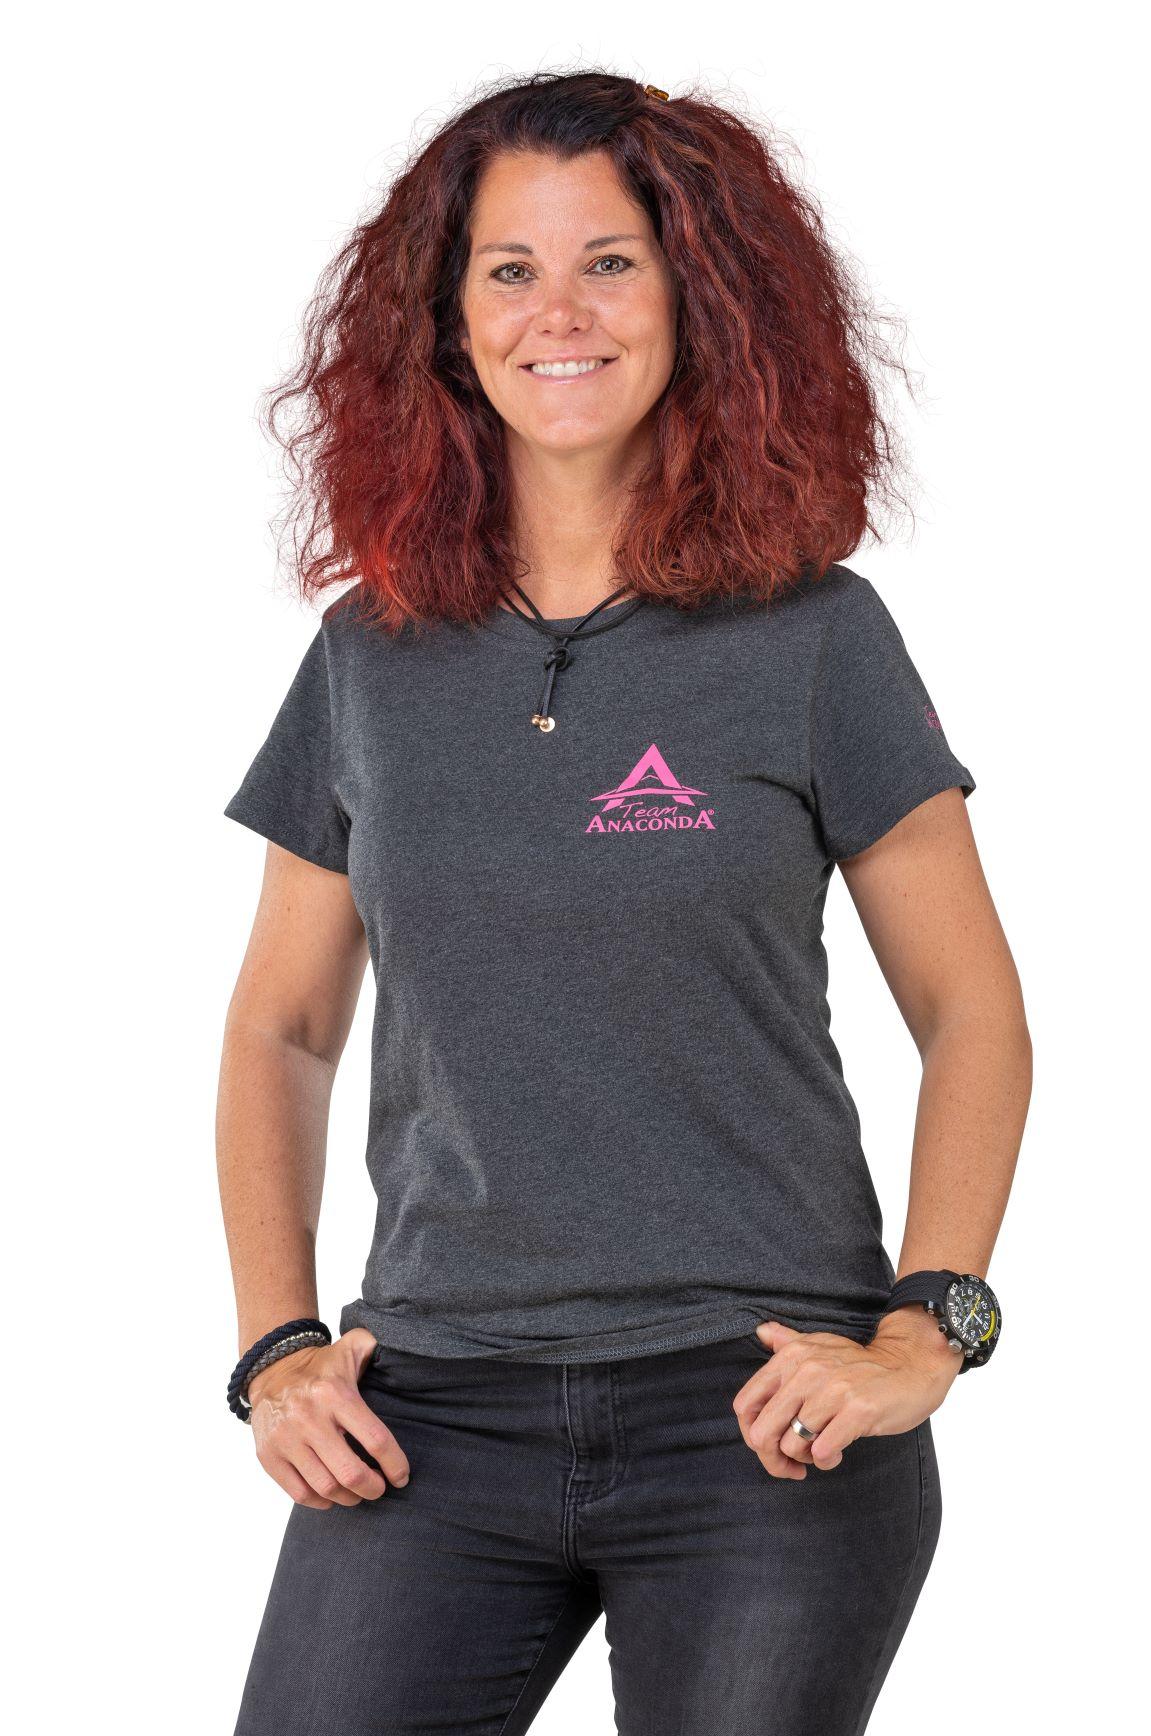 Anaconda dámské tričko Lady Team L